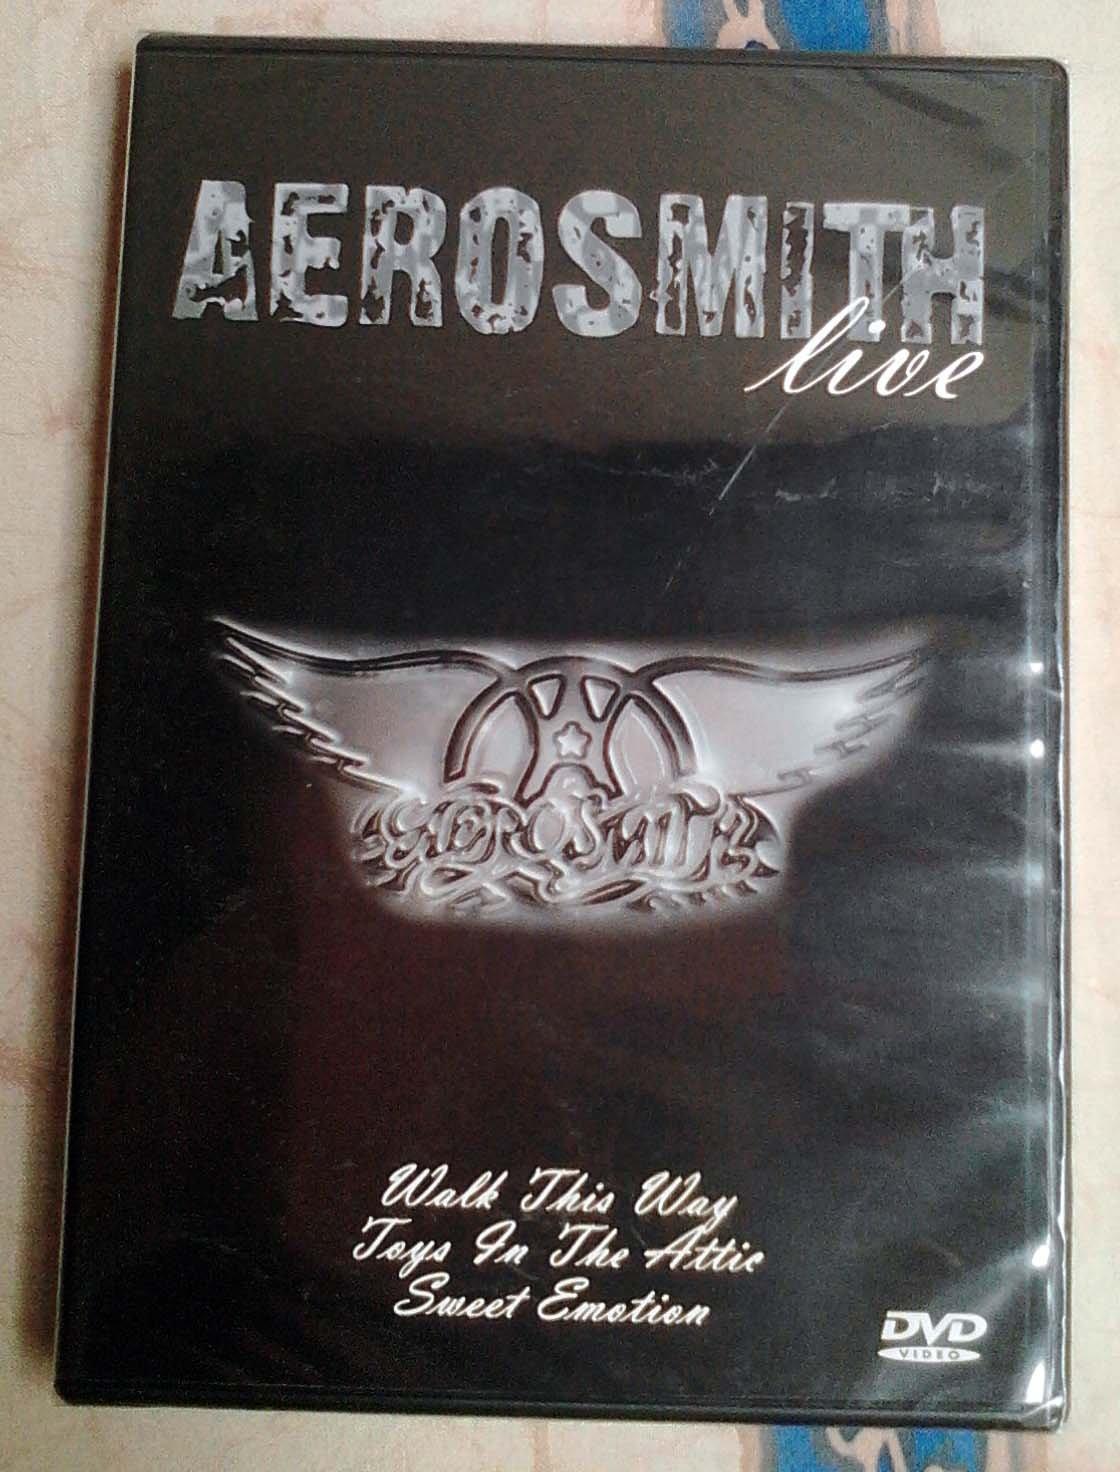 Aerosmith Live DVD